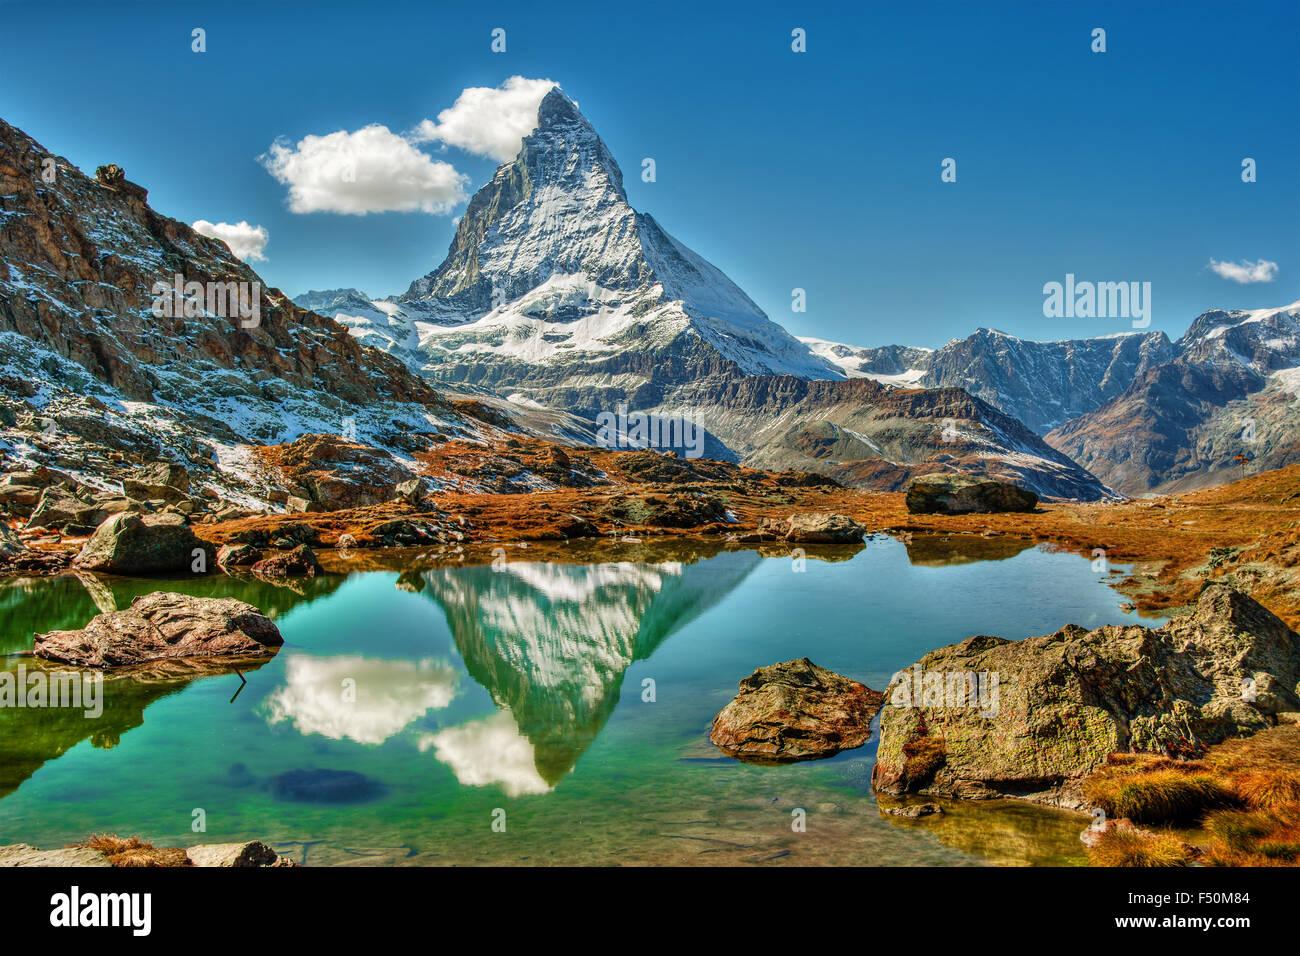 September 2015, the mountain Matterhorn in Zermatt (Switzerland) with its reflection in a alpine pond - Stock Image